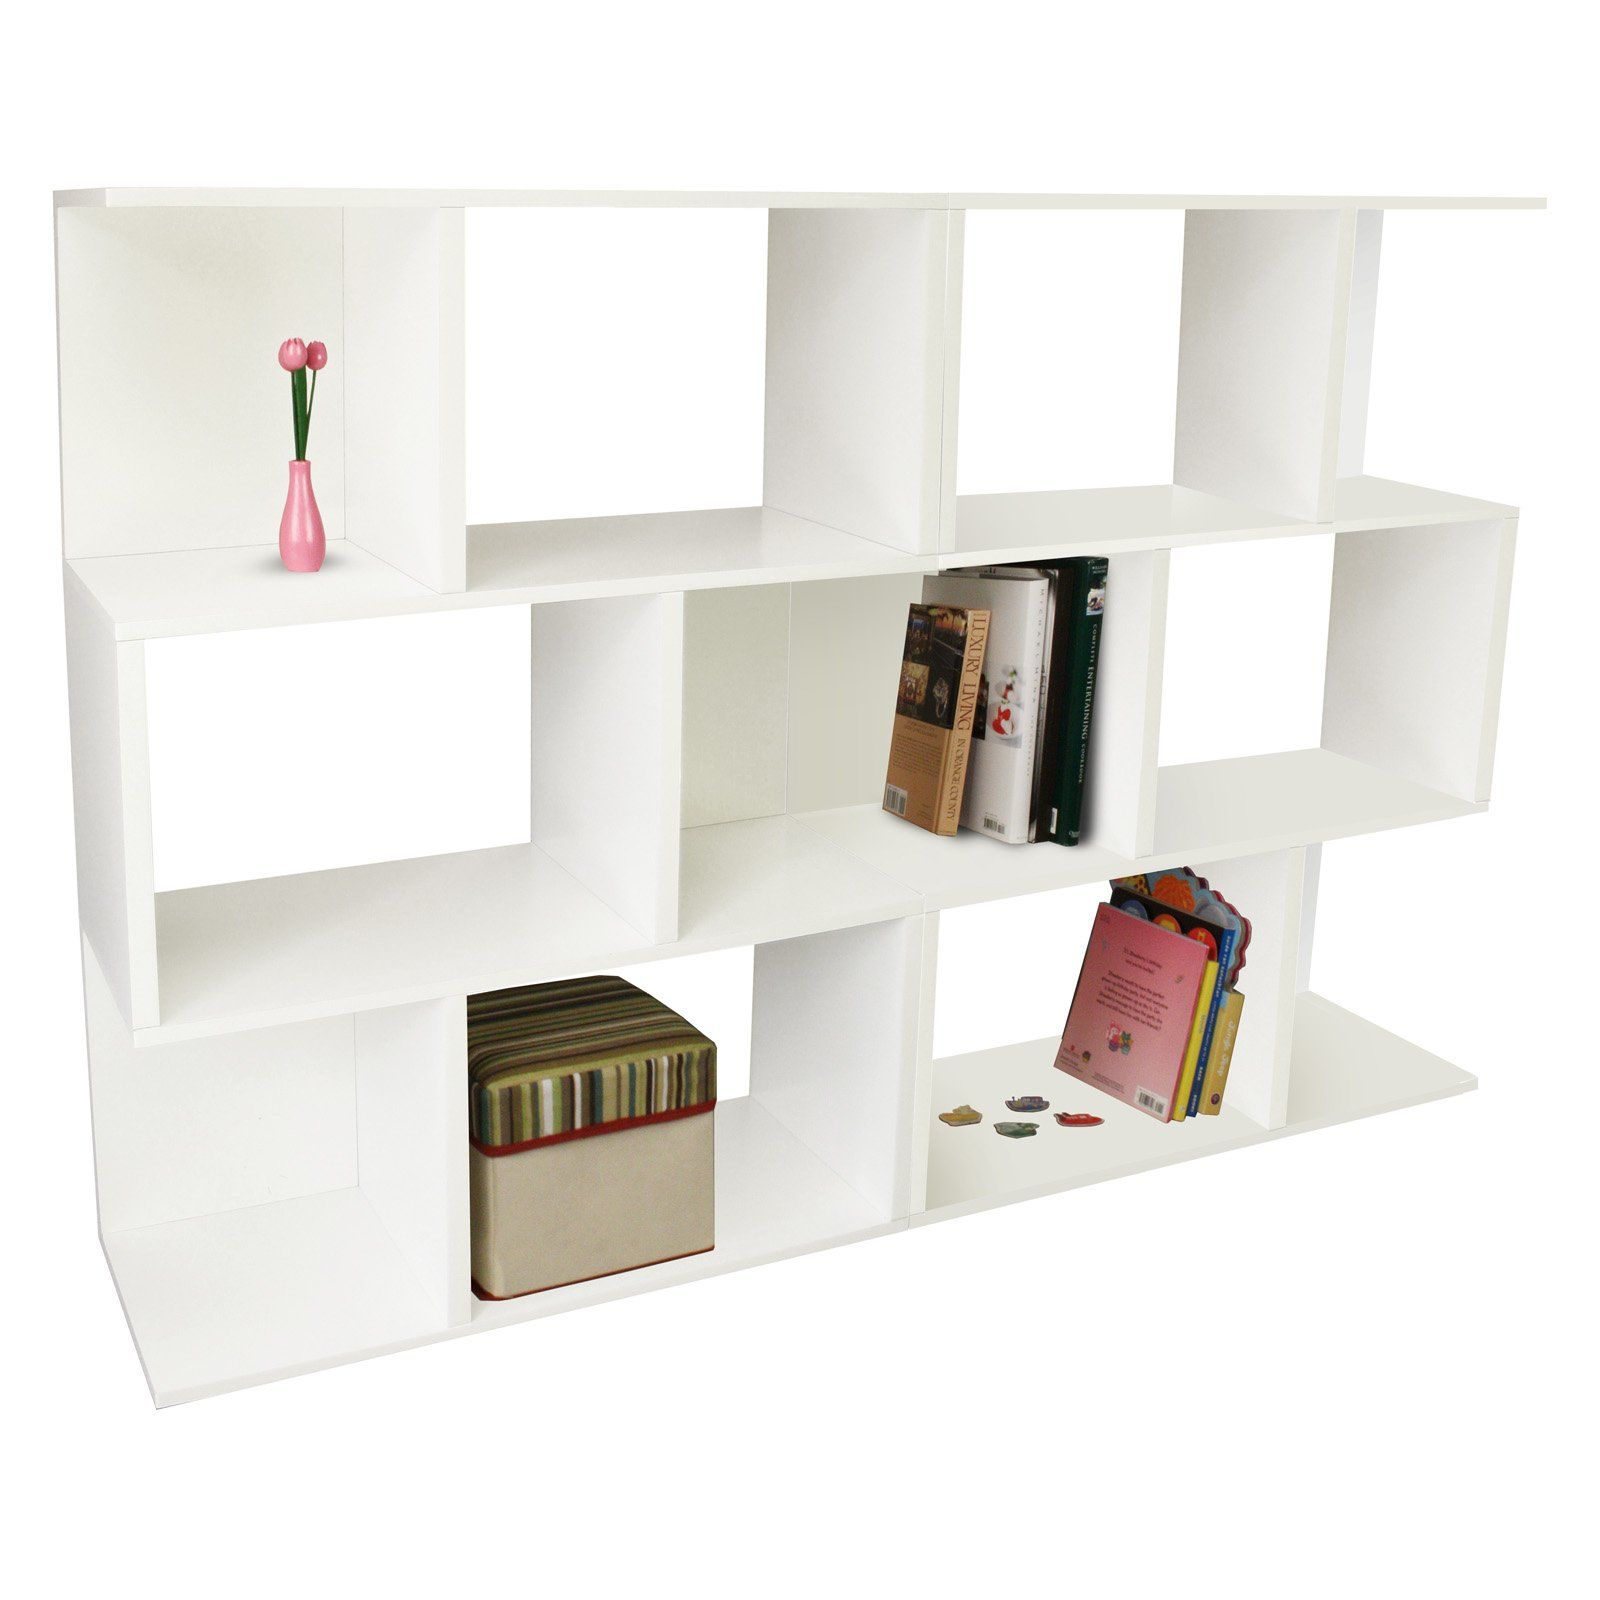 8 best kitchen shelf unit images on pinterest bookcase white